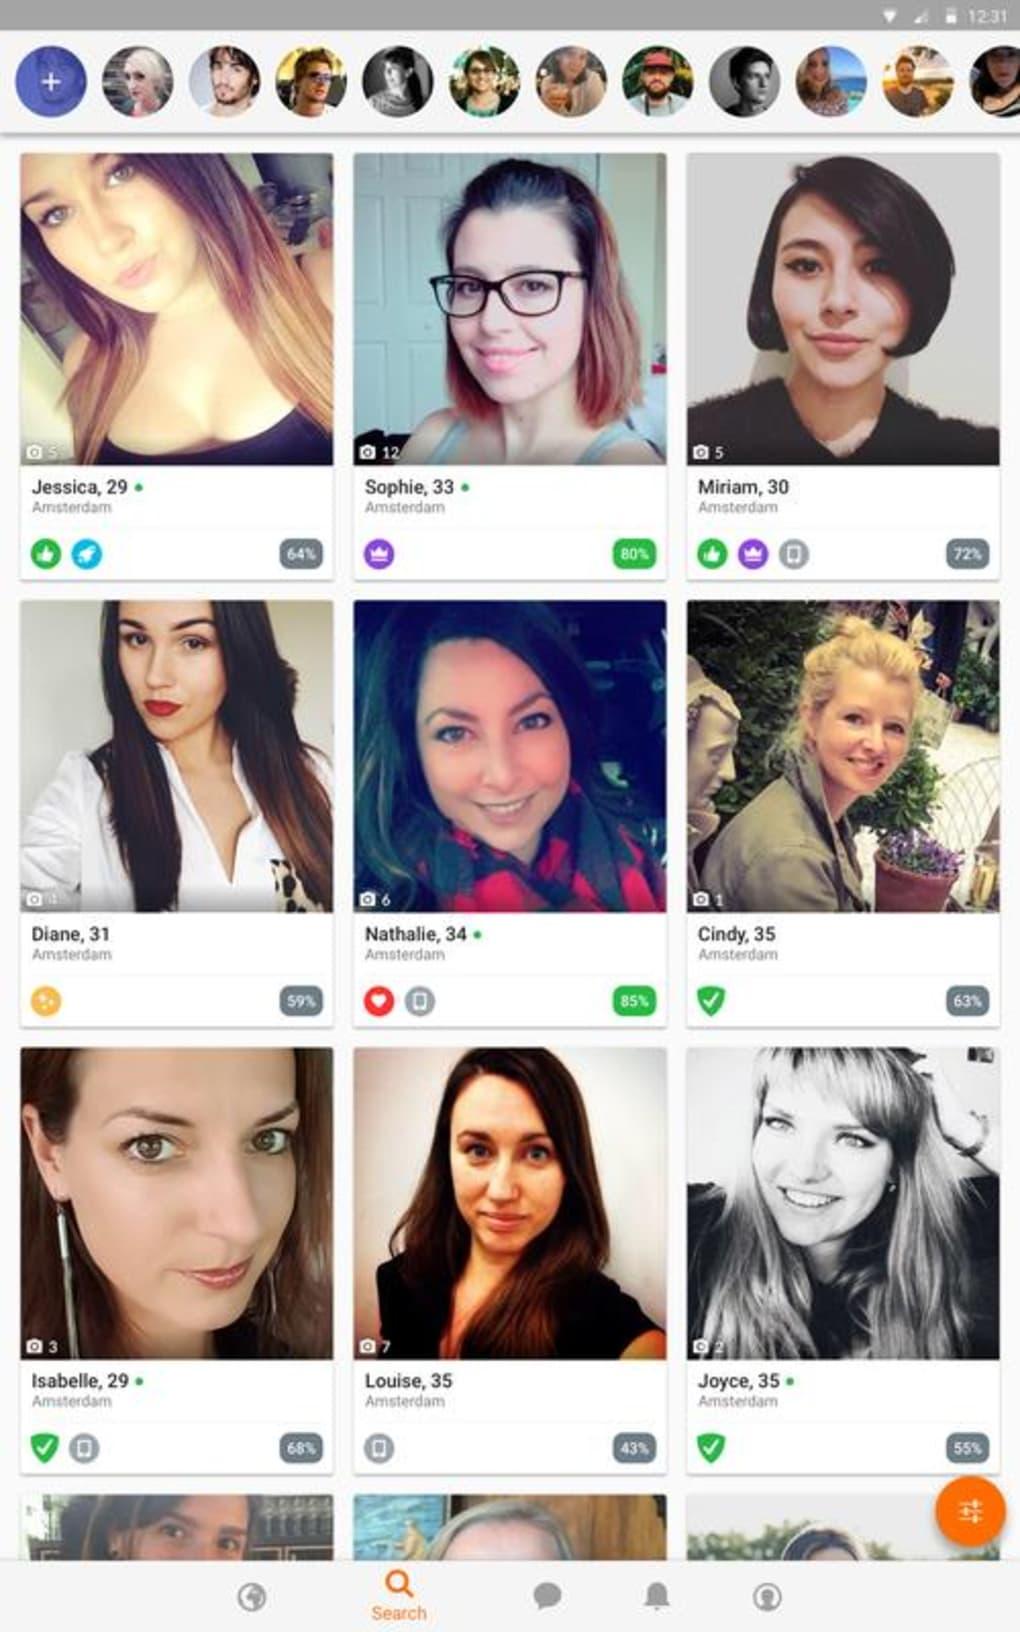 Aasian mies valkoinen nainen dating sites